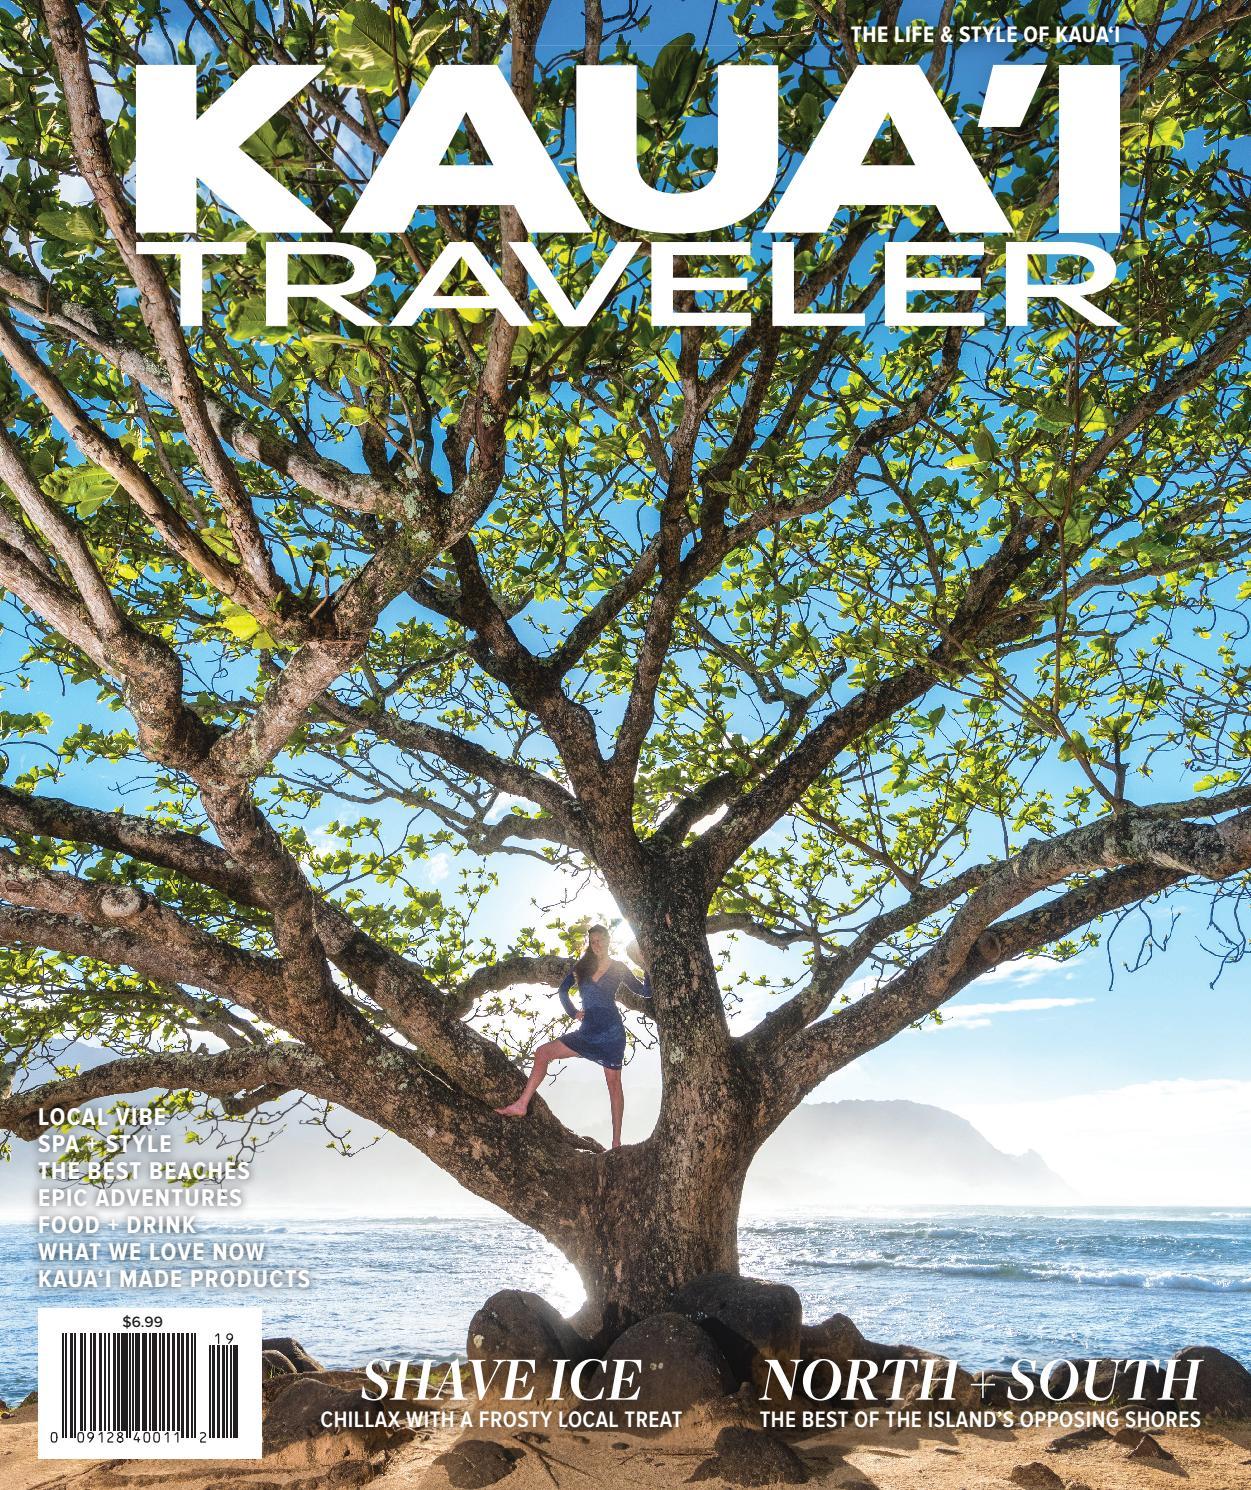 21991f2f3c82d Kauai Traveler by Traveler Media - issuu